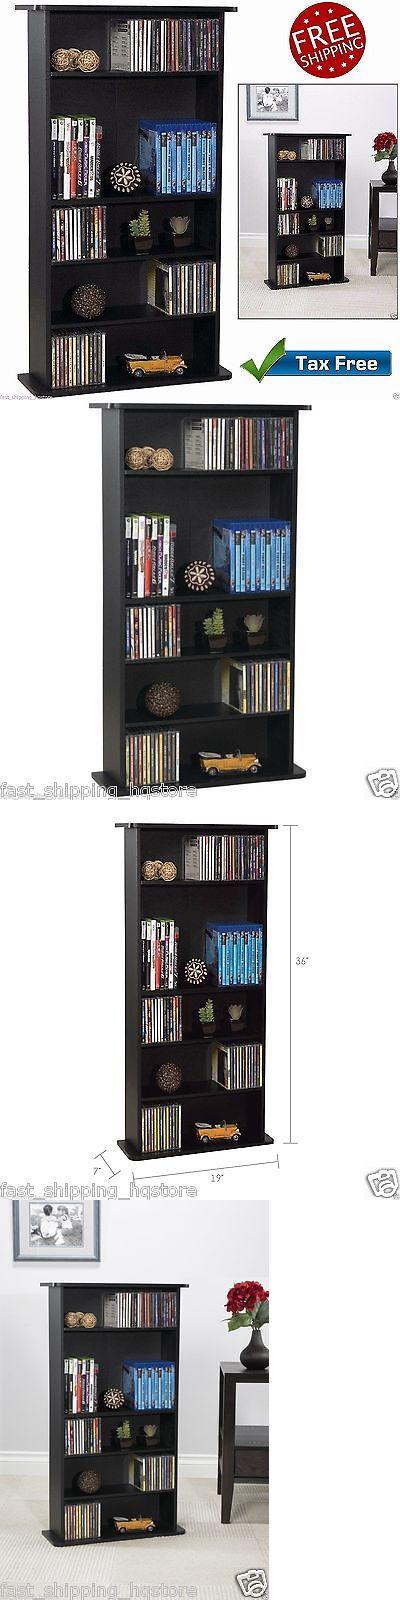 CD and Video Racks 22653: Dvd Storage Rack Cd Video Organizer Multimedia Shelves Media Tower Wood Cabinet -> BUY IT NOW ONLY: $42.99 on eBay!